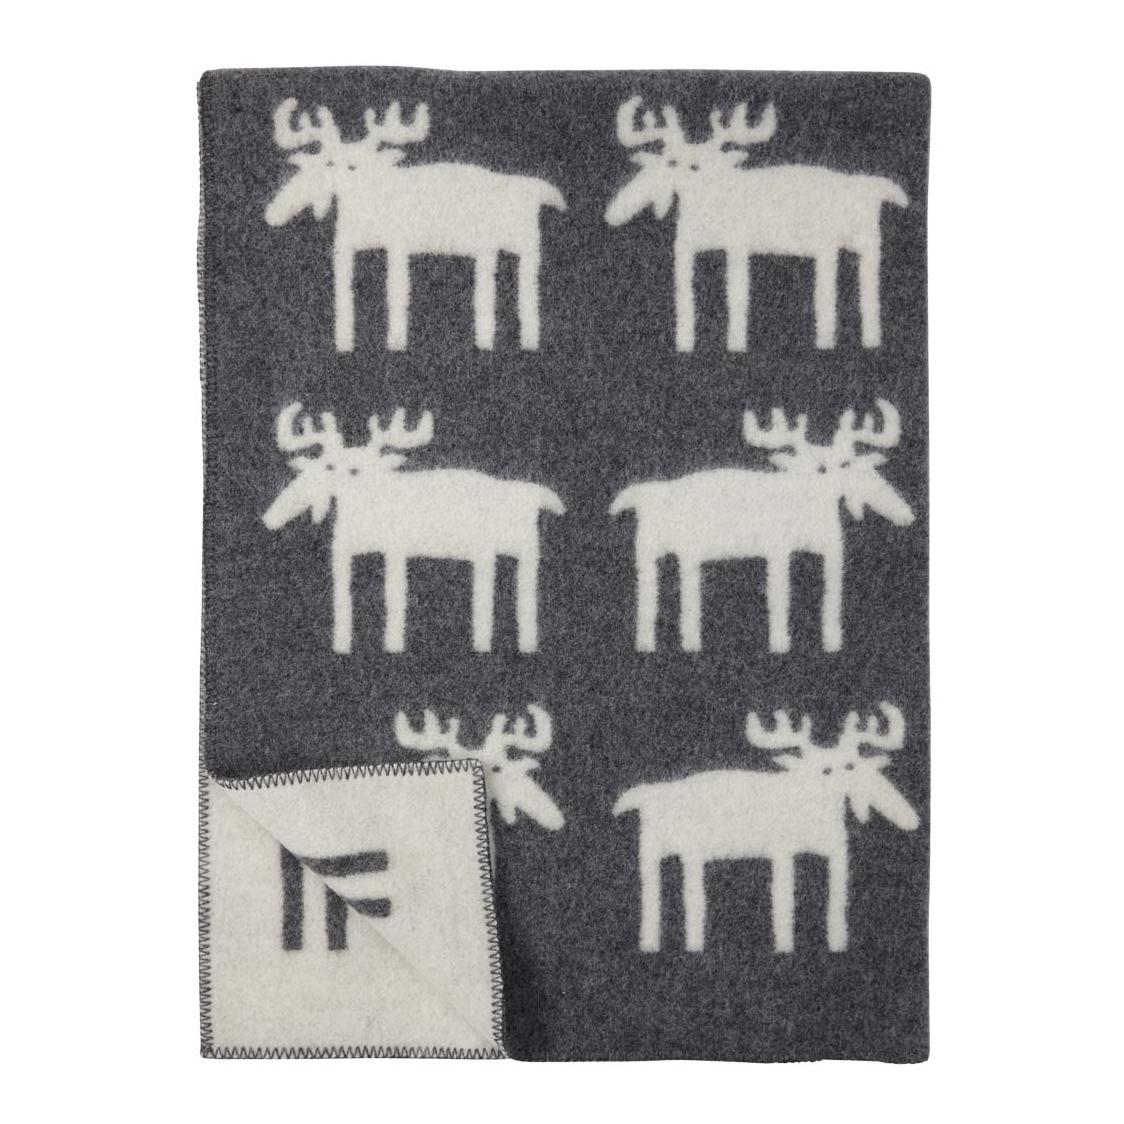 Älgar Moose Ullfilt grey, Klippan Yllefabrik